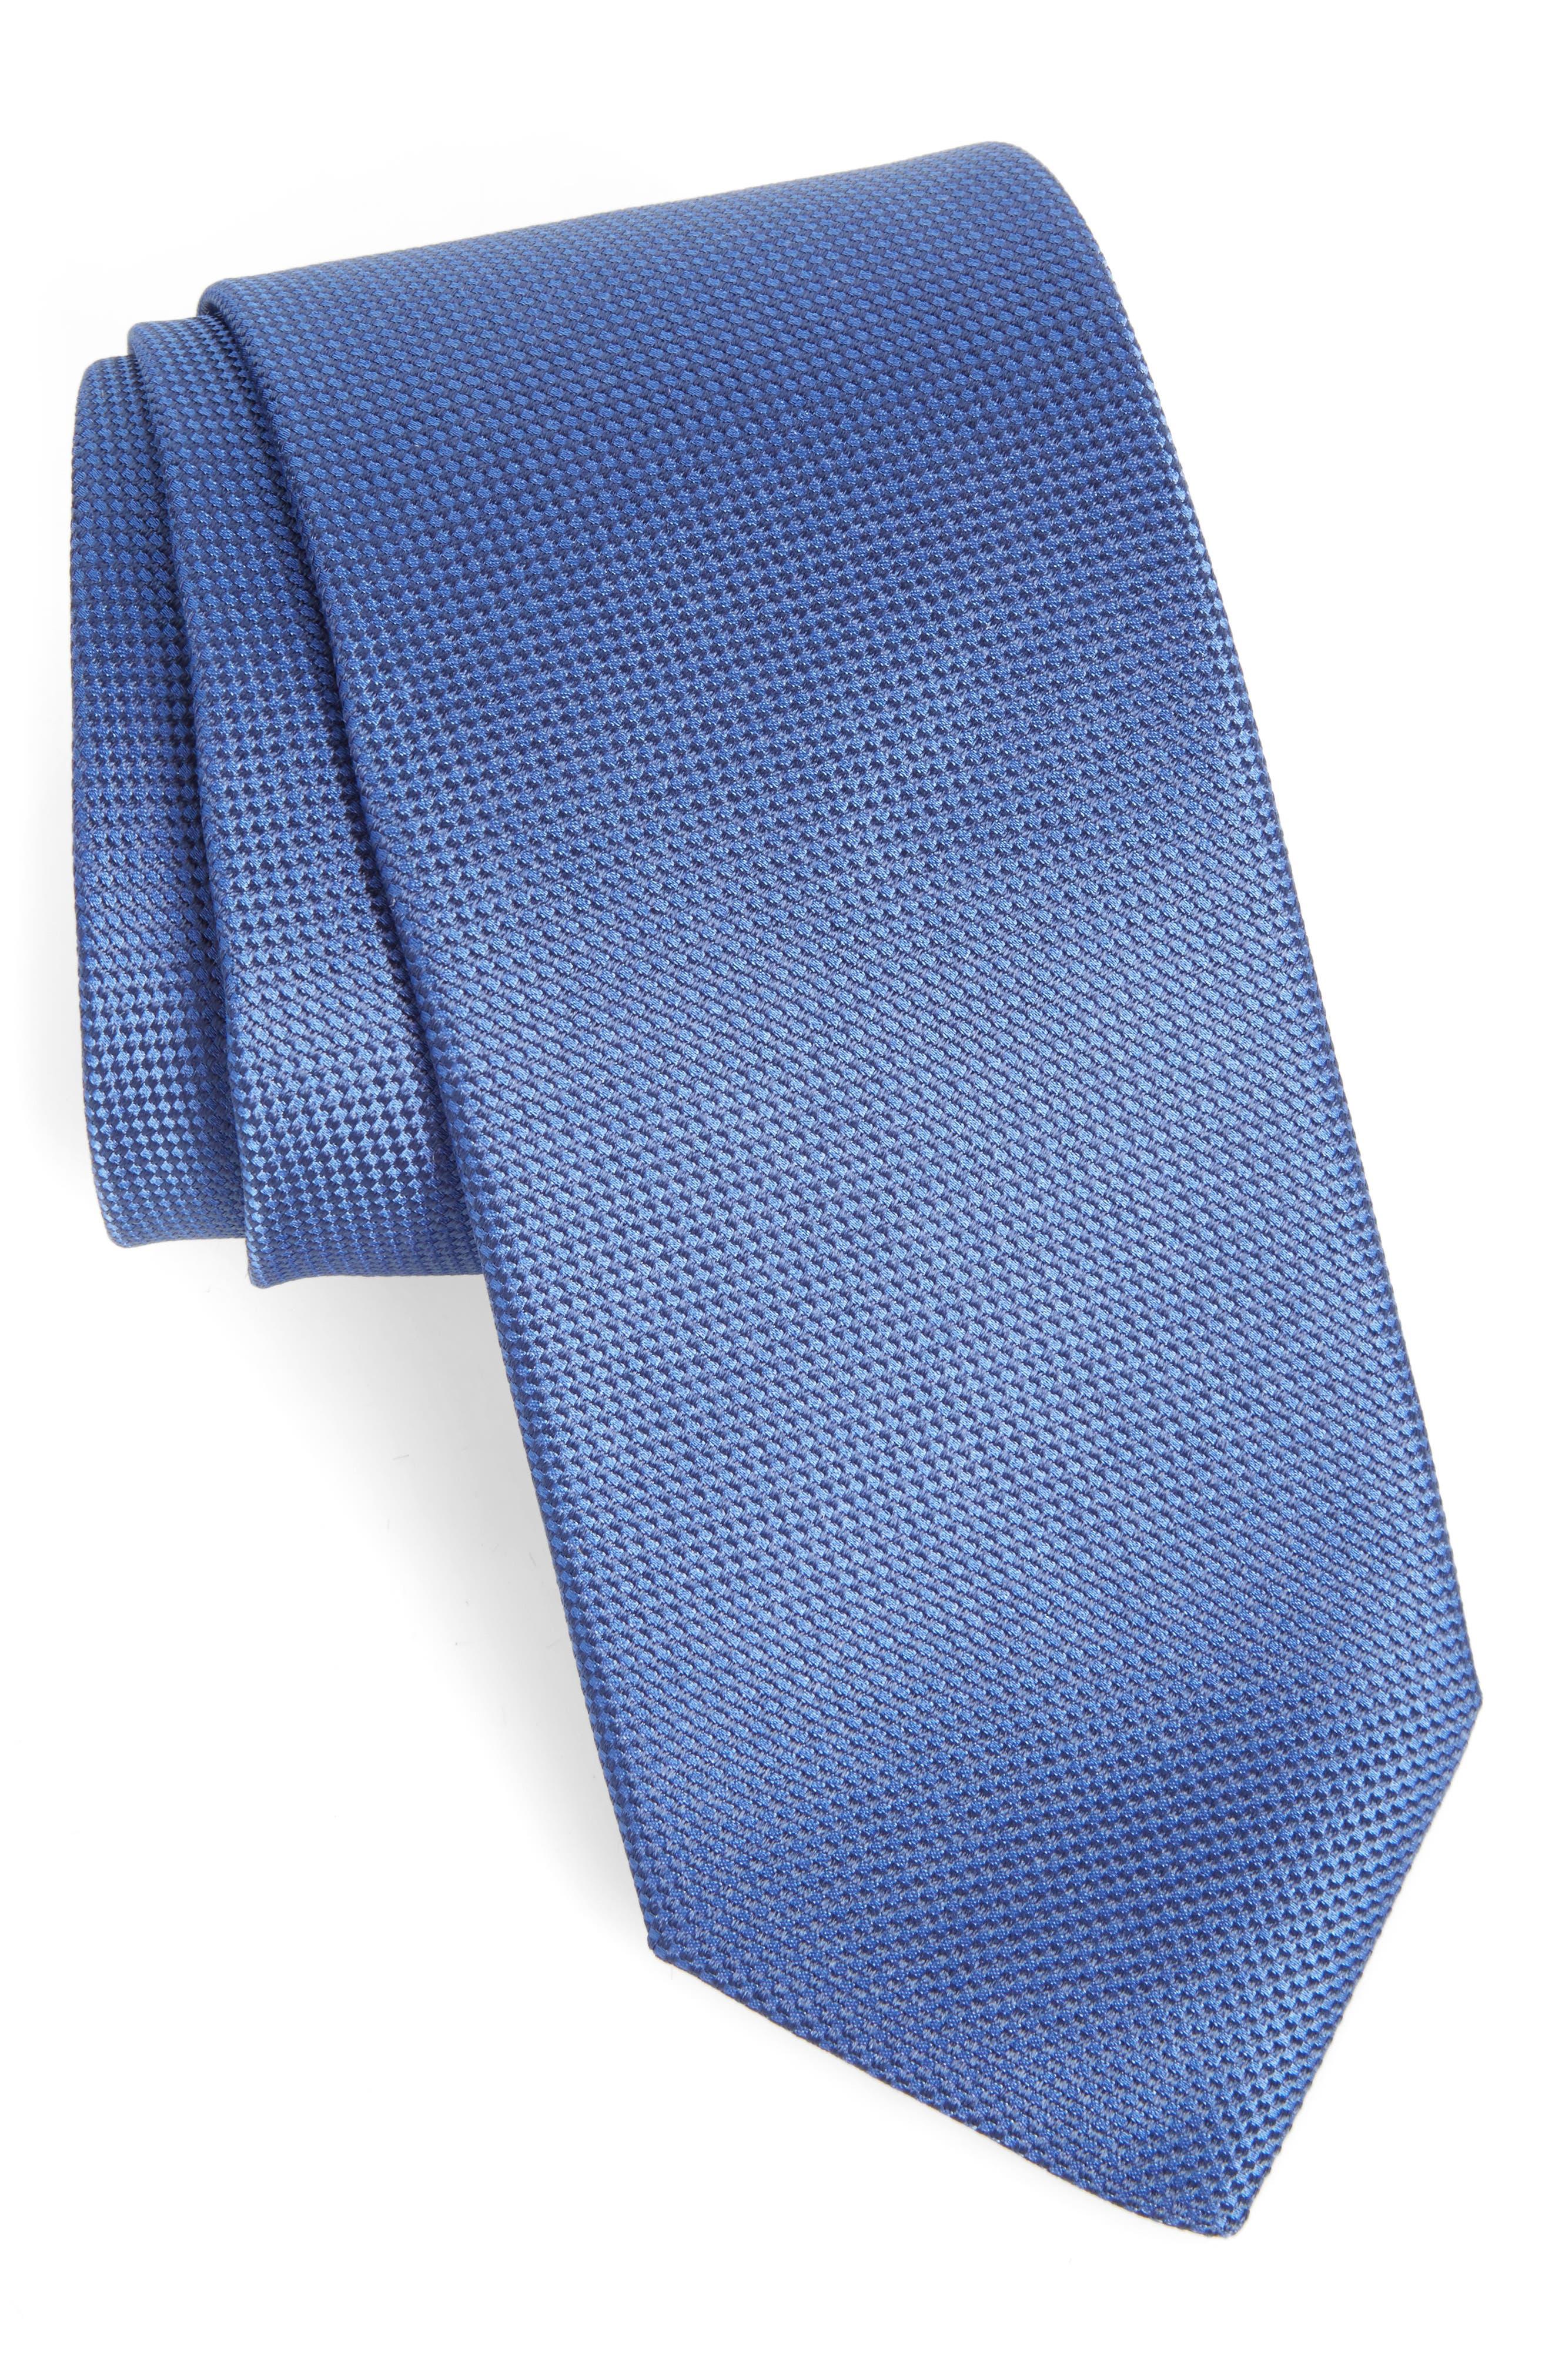 'Ryder' Silk Tie,                             Main thumbnail 1, color,                             400